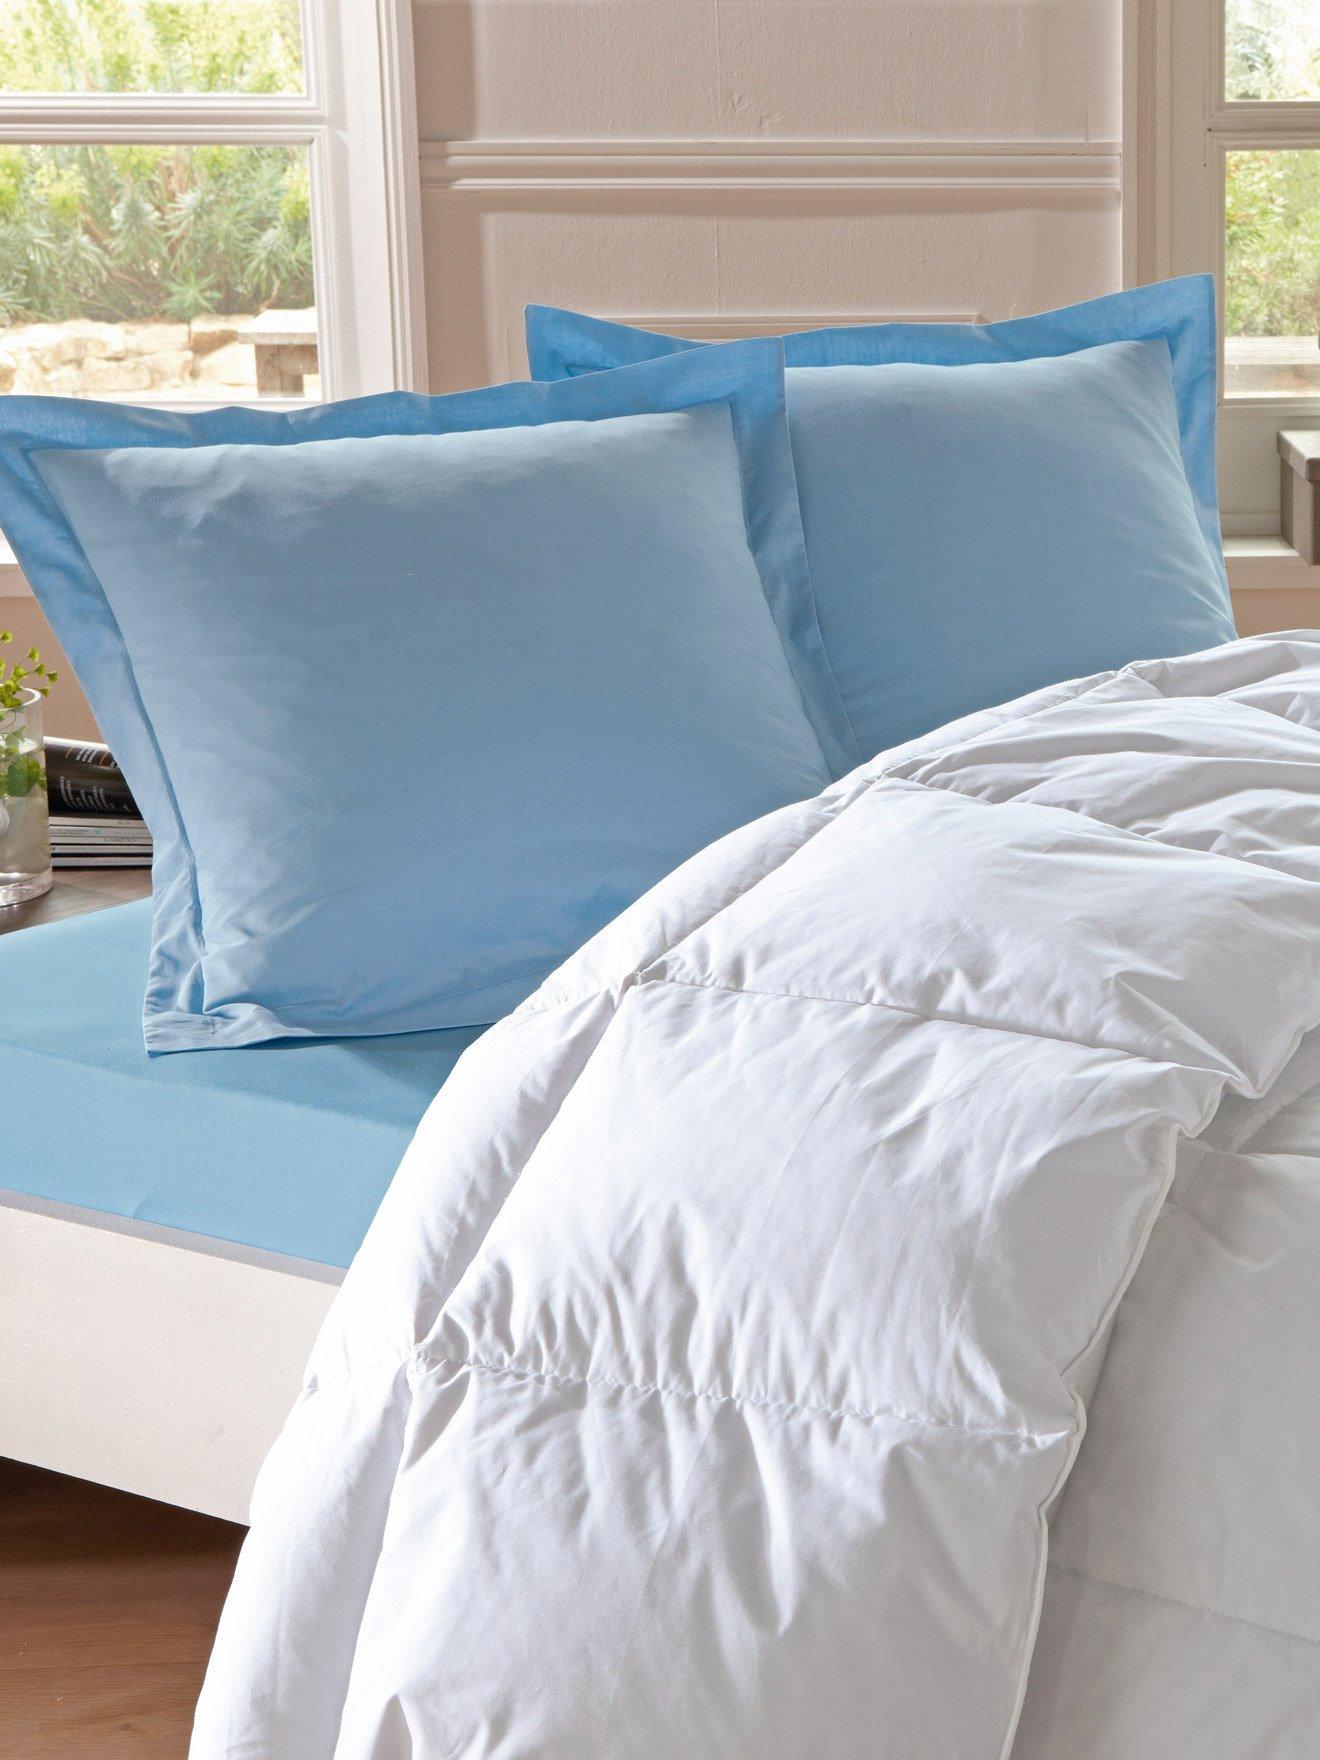 couette duvet anti acariens daxon. Black Bedroom Furniture Sets. Home Design Ideas